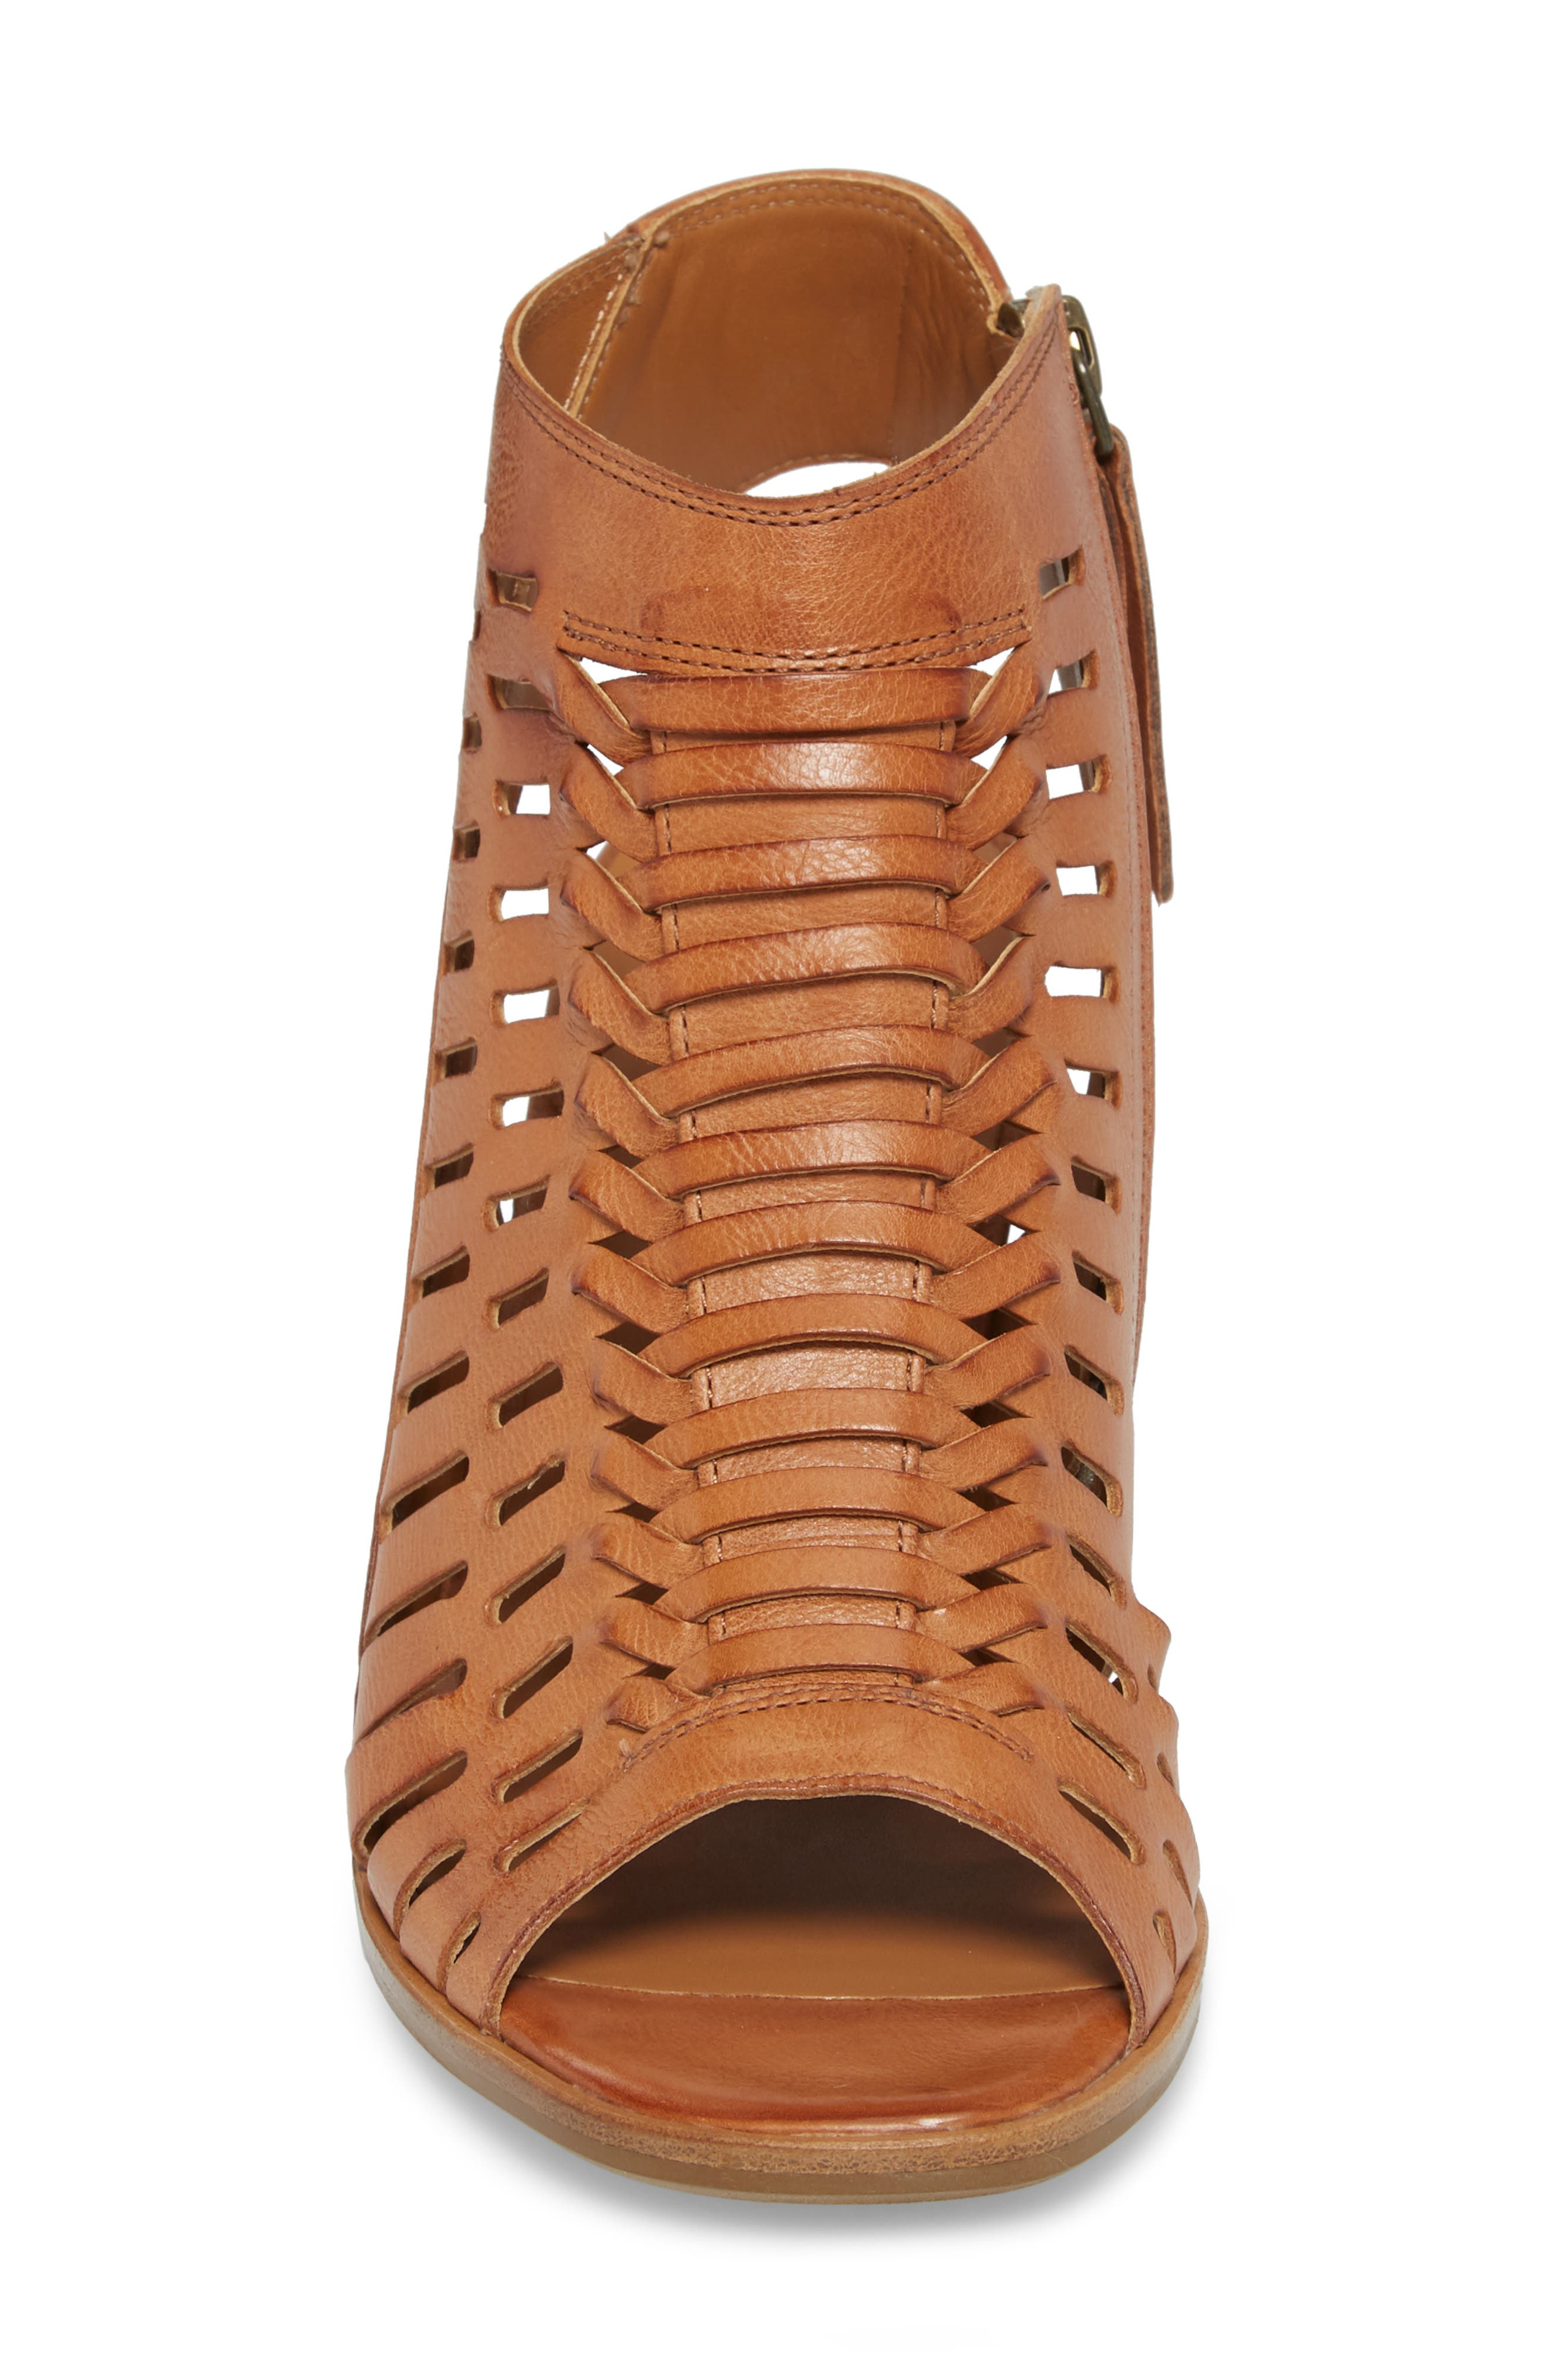 Rosa Woven Peep Toe Sandal,                             Alternate thumbnail 4, color,                             Cuoio Leather